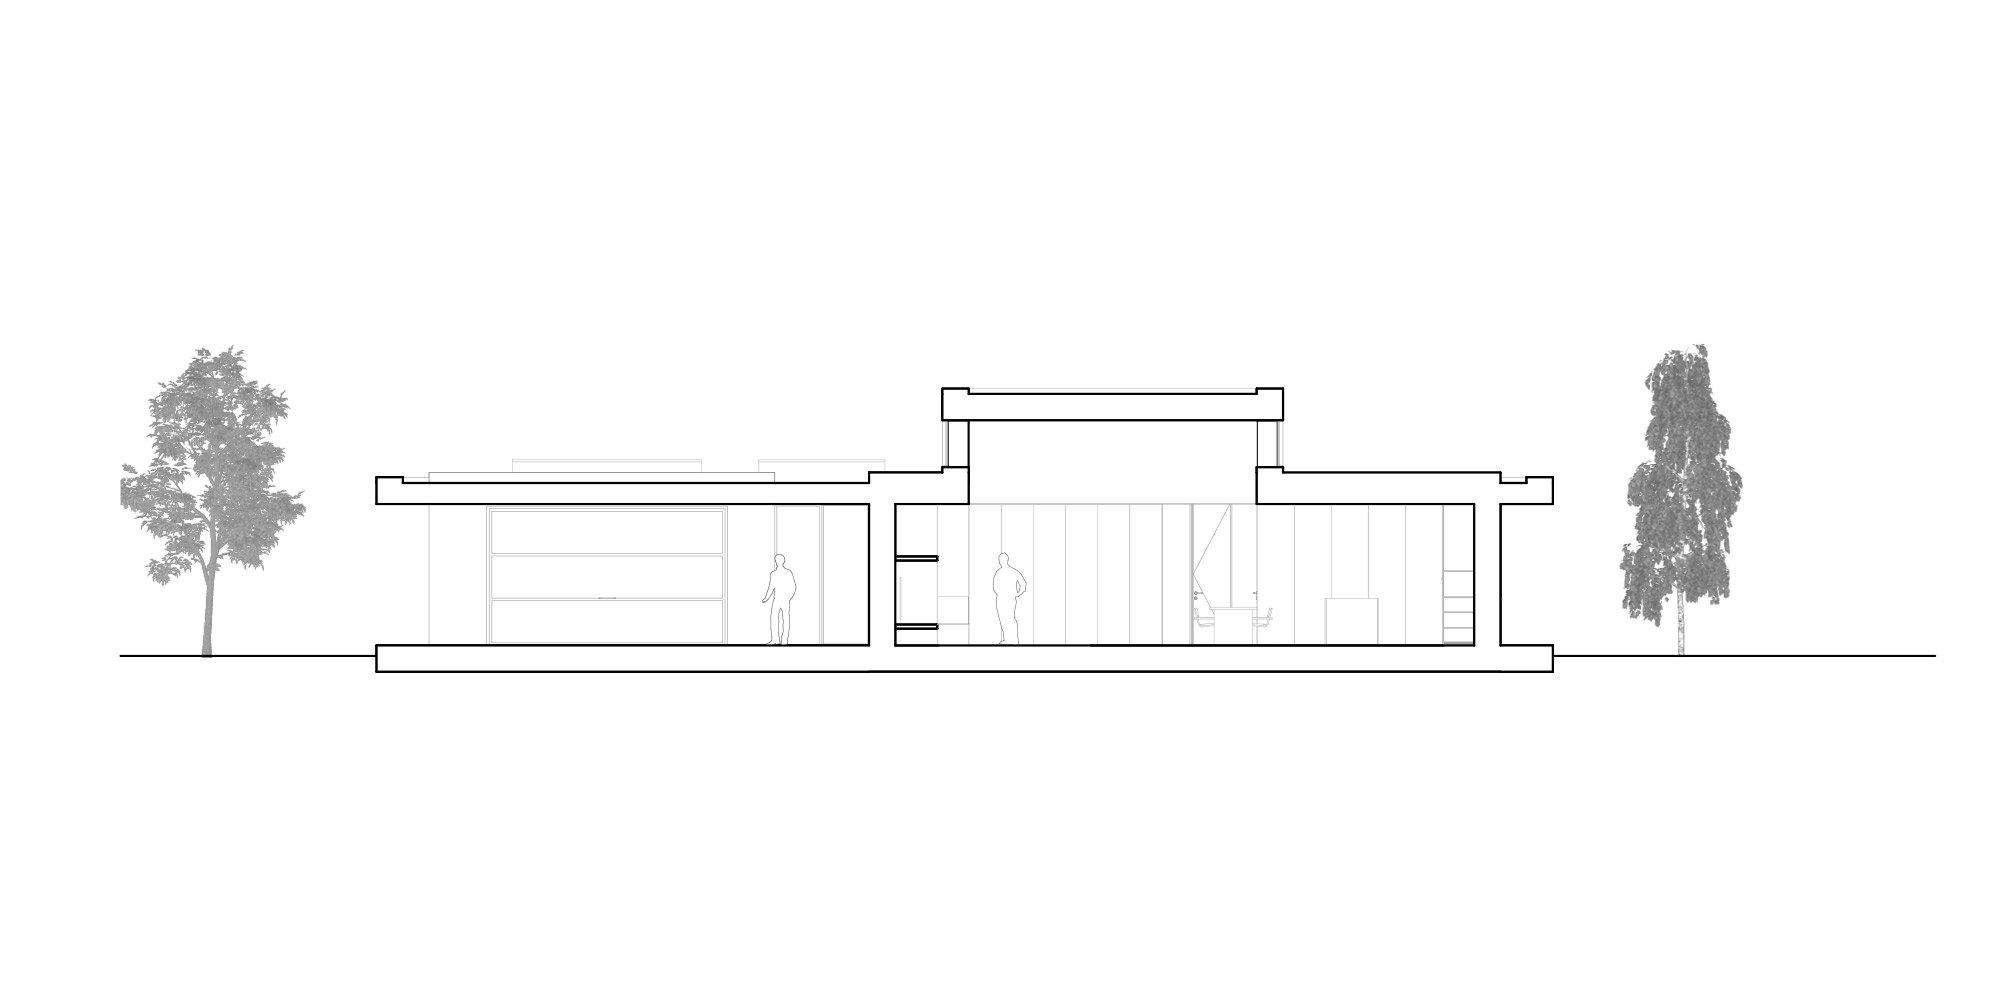 Sezione BB © Didonè Comacchio Architects